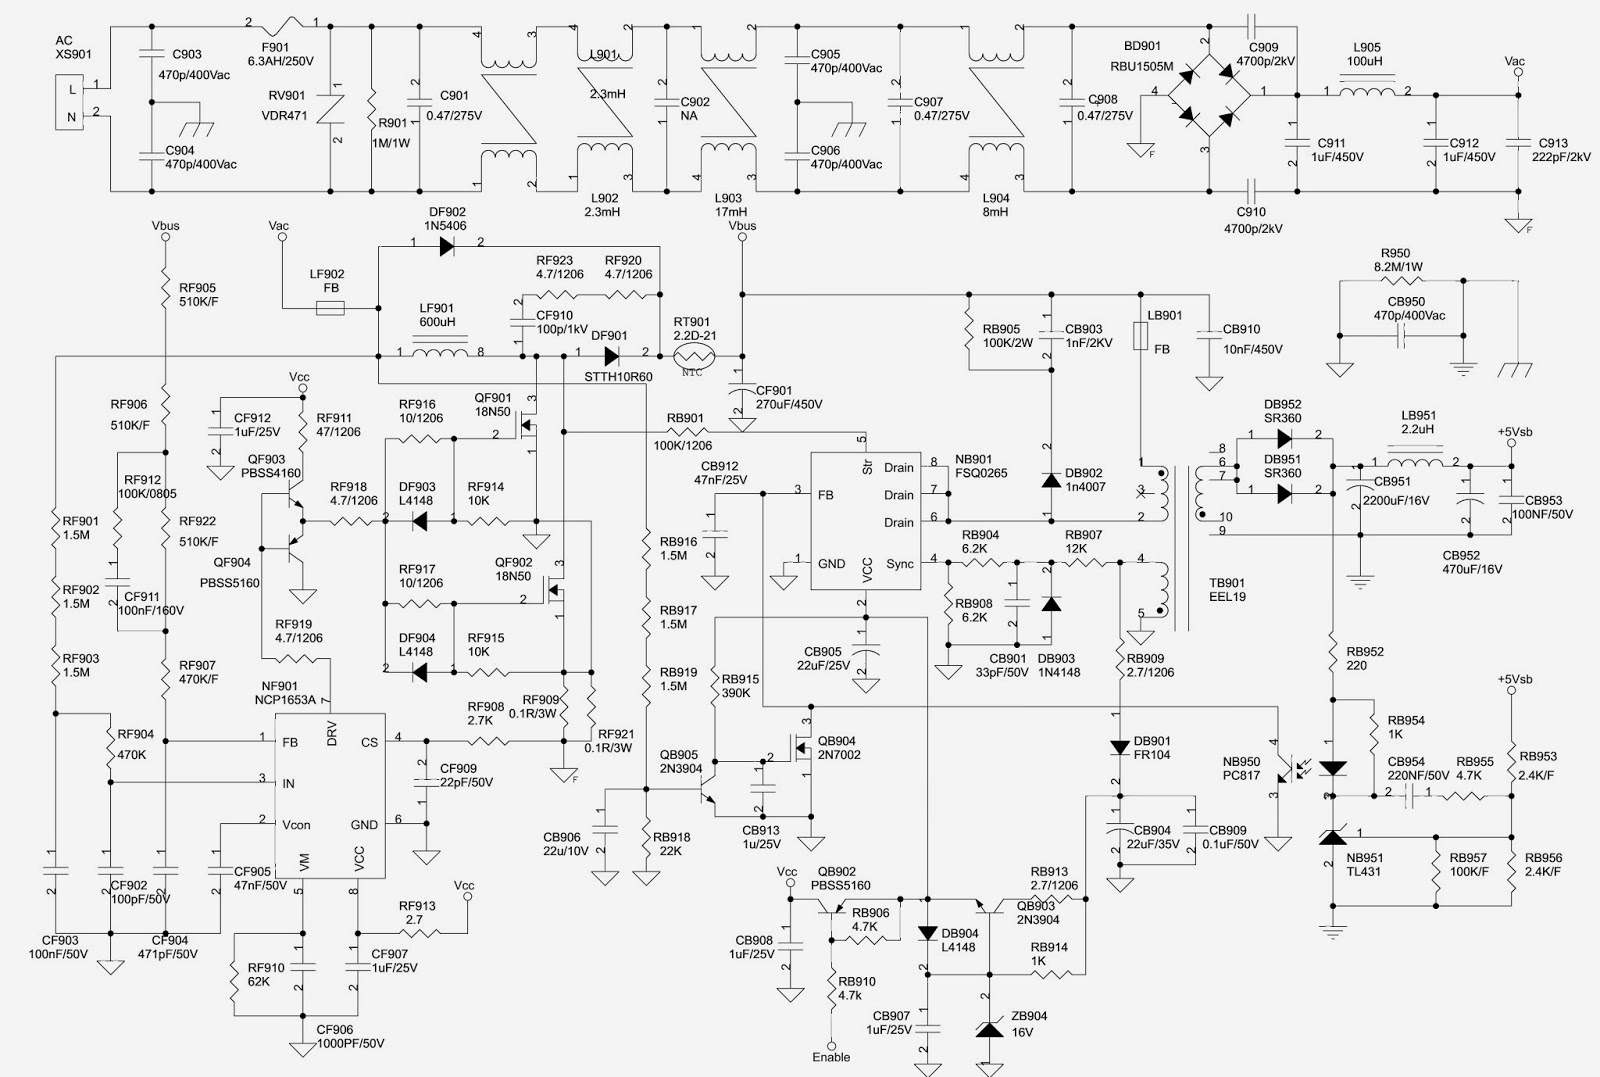 toshiba tv schematic diagrams wiring diagram today toshiba led tv schematic diagram [ 1600 x 1077 Pixel ]